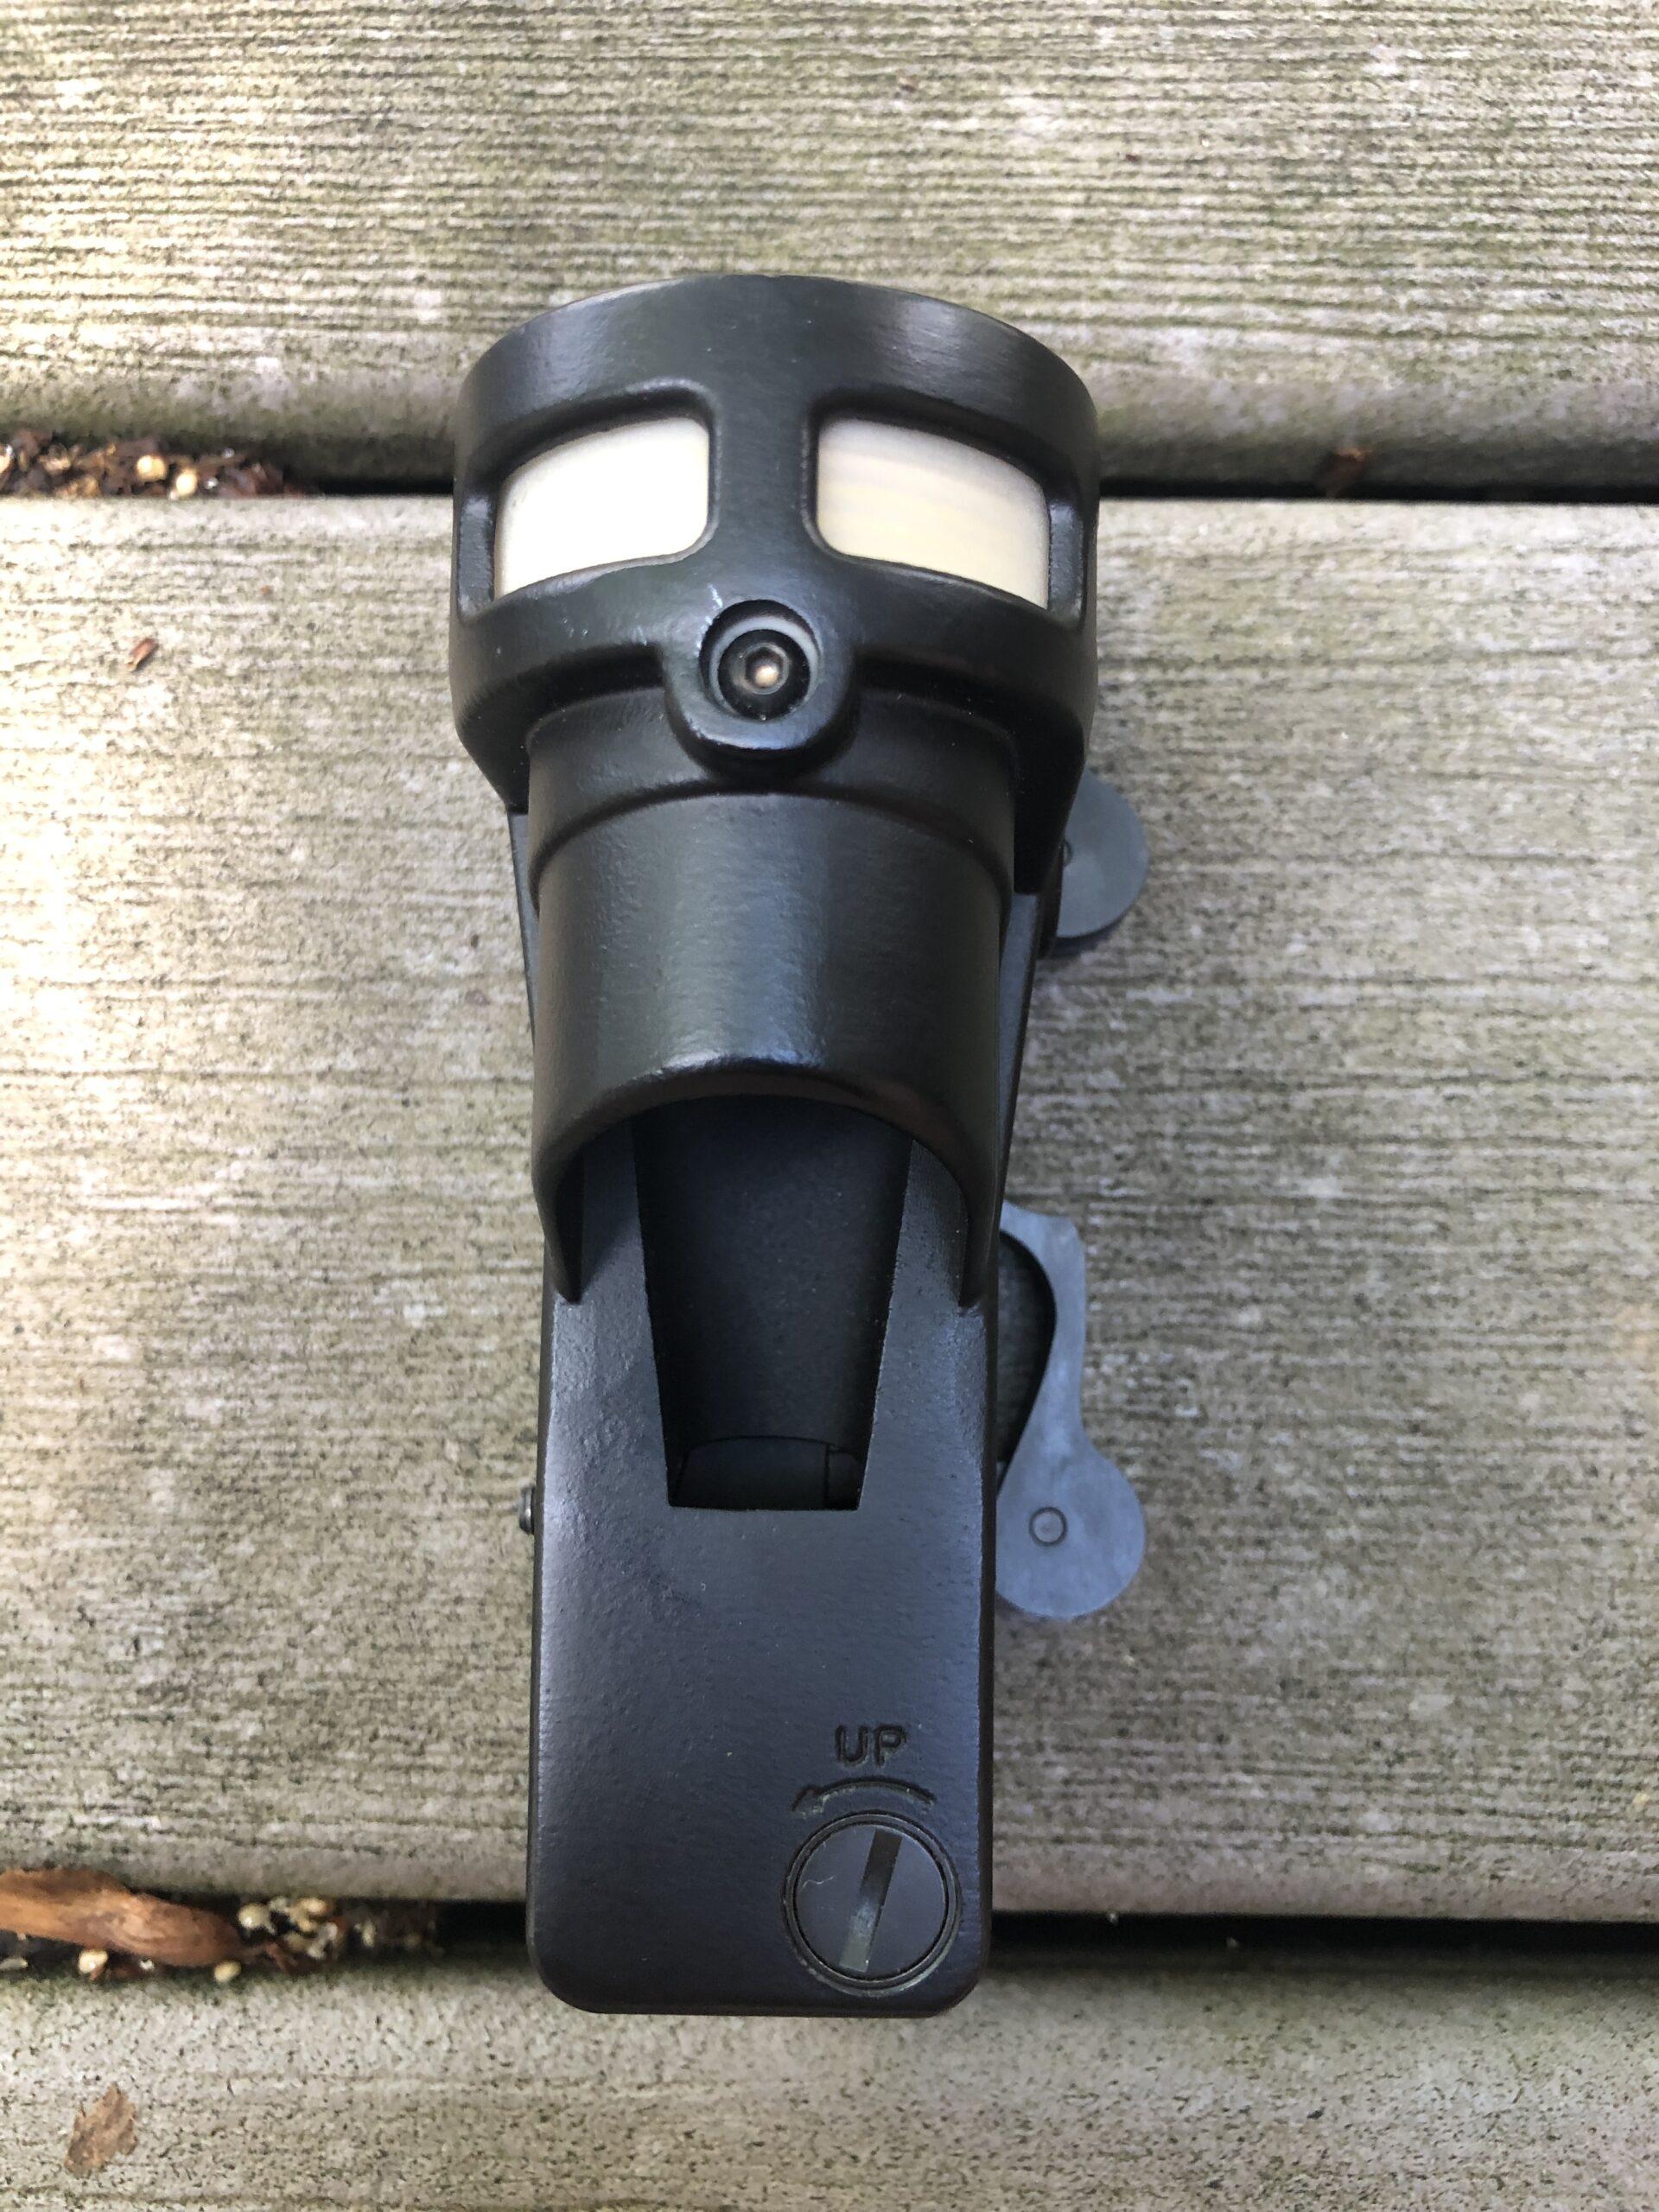 Meprolight M21 good?